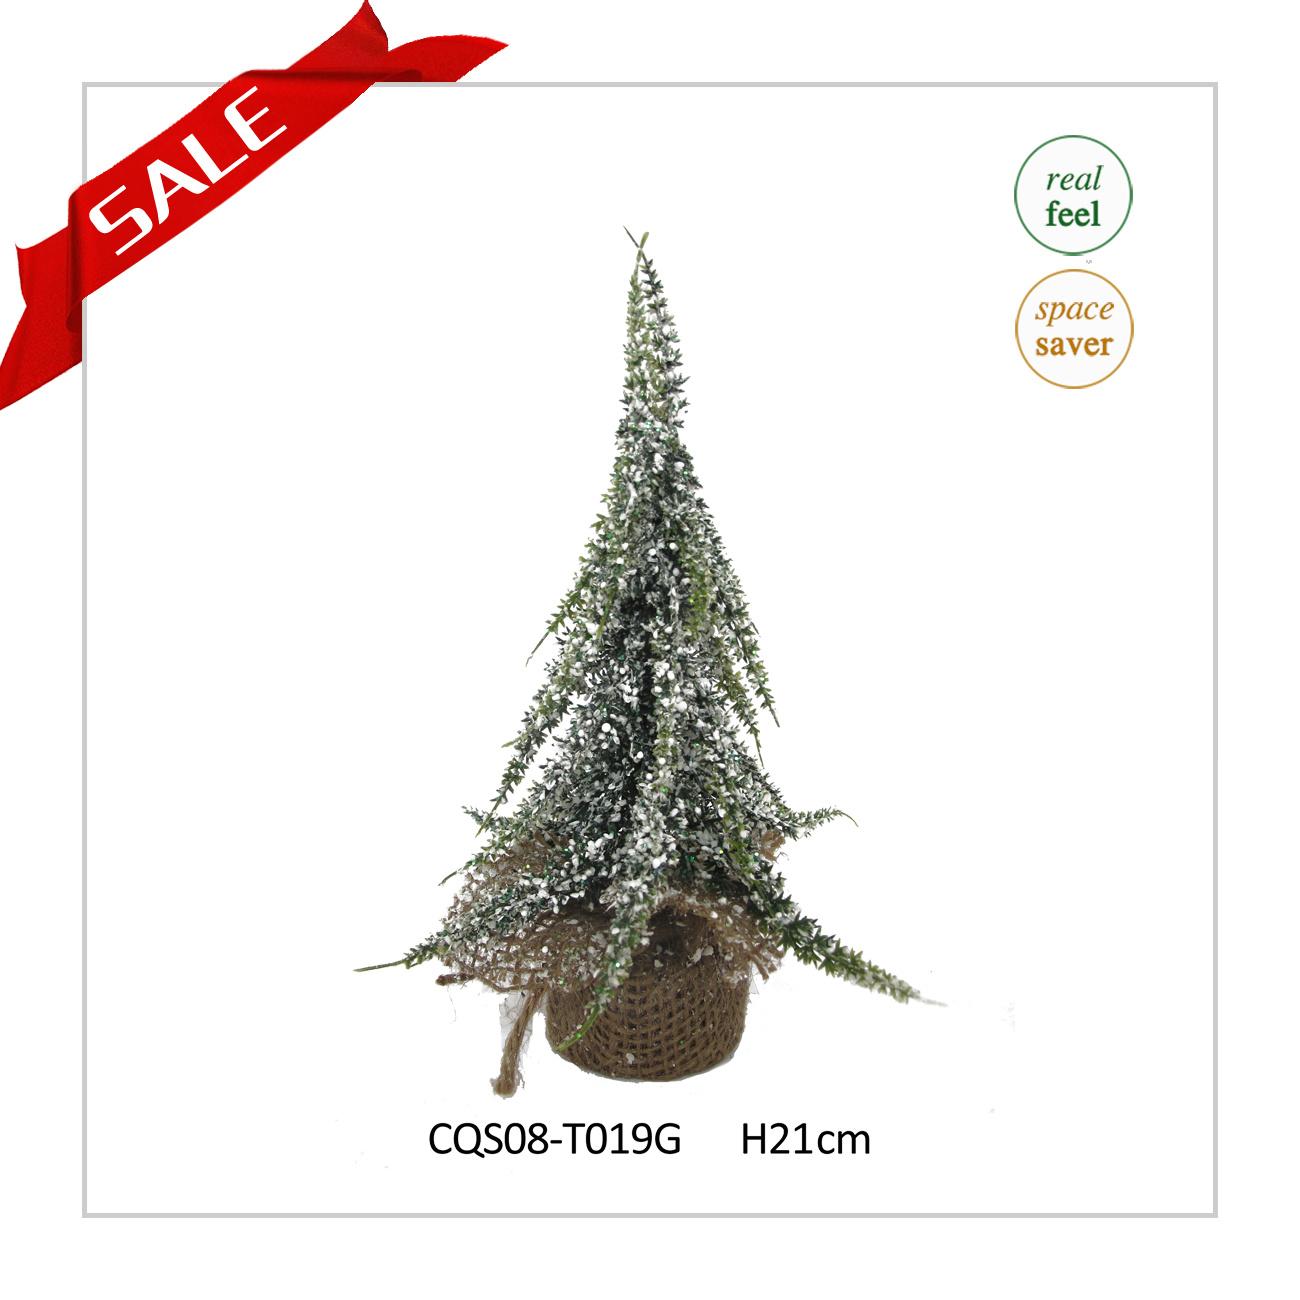 25cm Wholesale Artificial Christmas Tree Artificial Flower